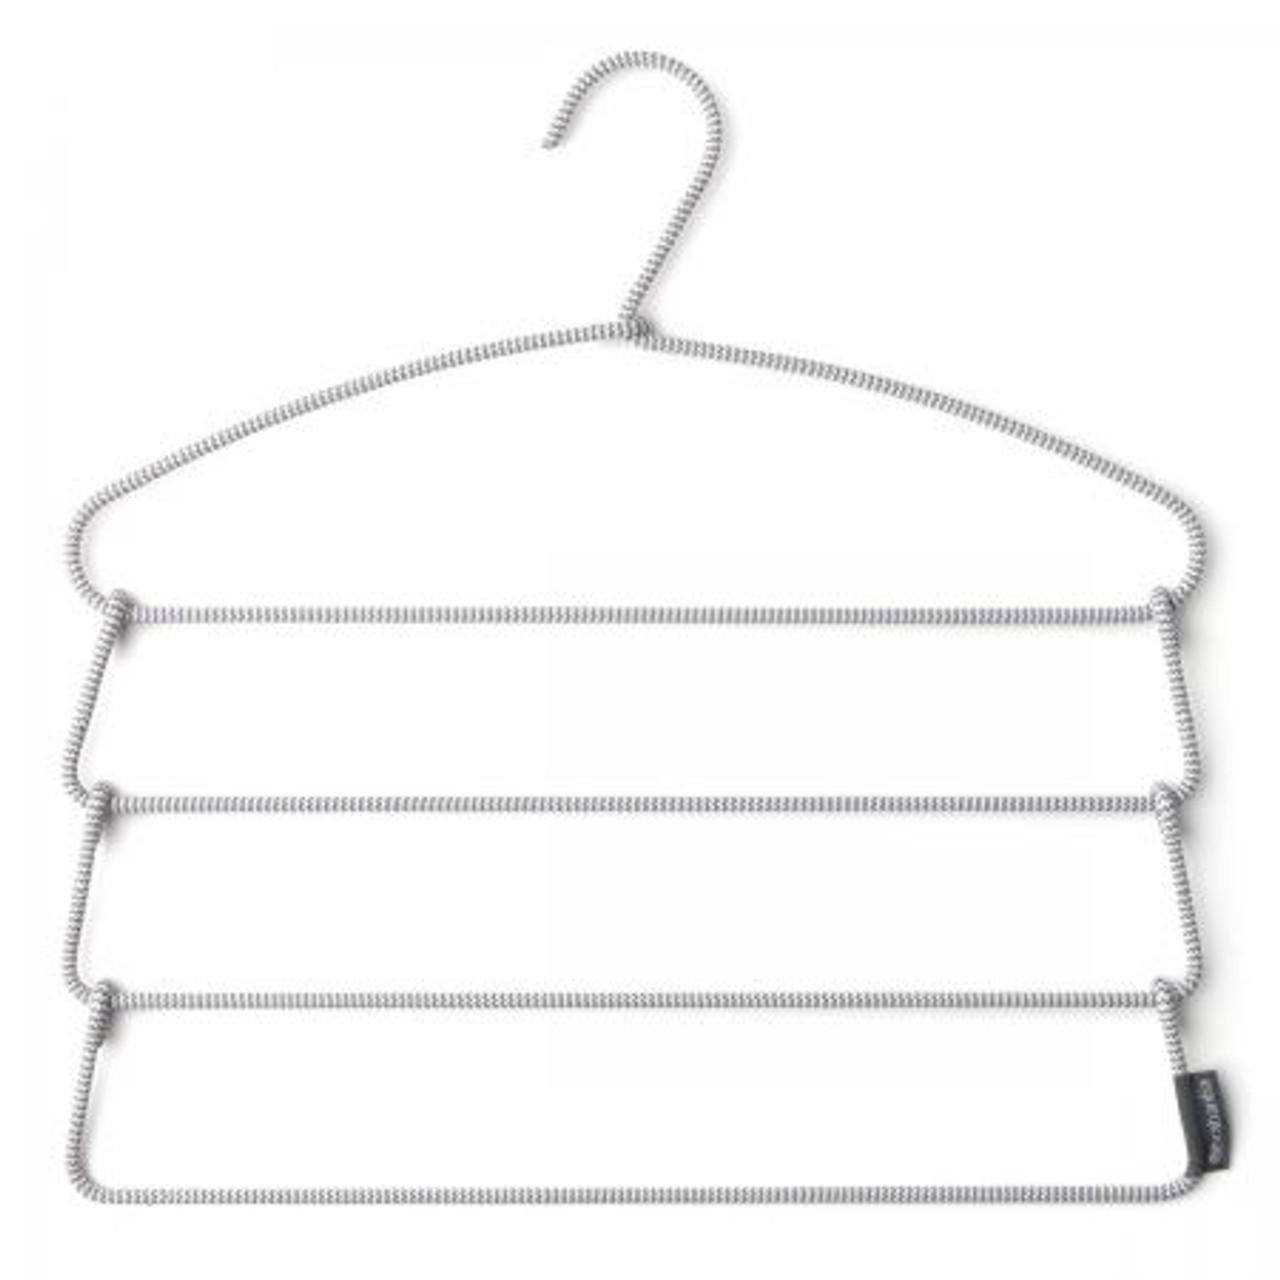 Brabantia Trousers Hanger